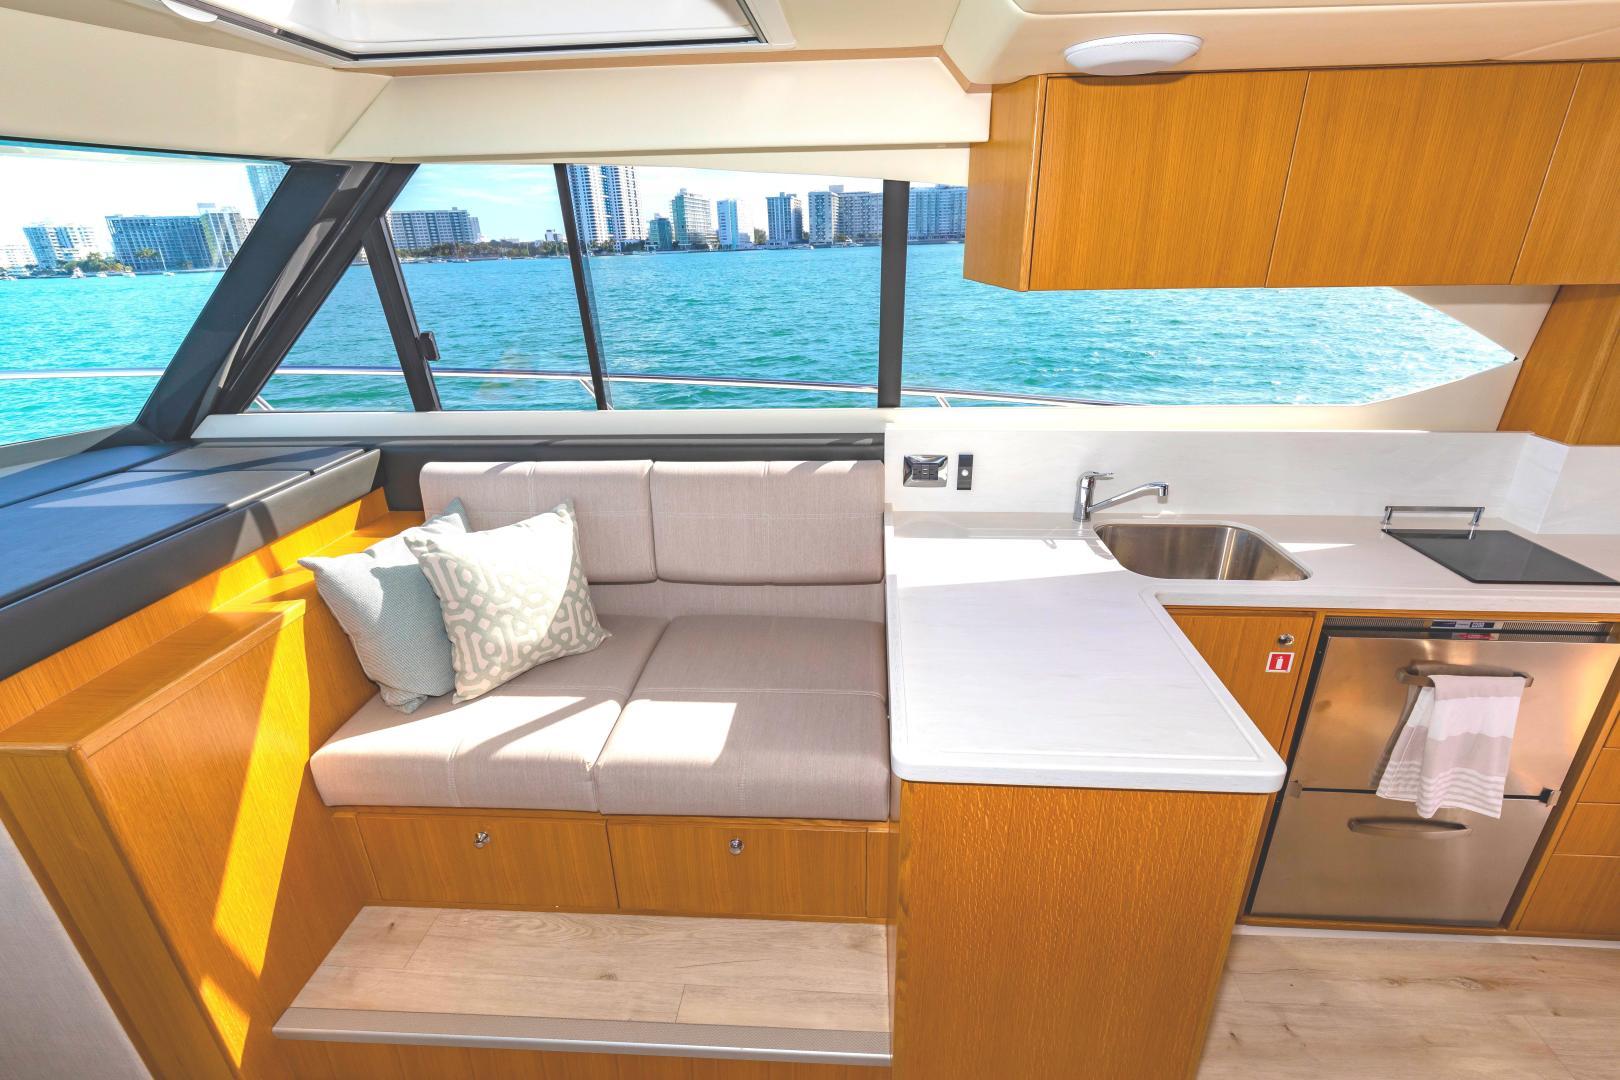 Riviera-395 SUV 2019-Ipanema Miami Beach-Florida-United States-1614916   Thumbnail